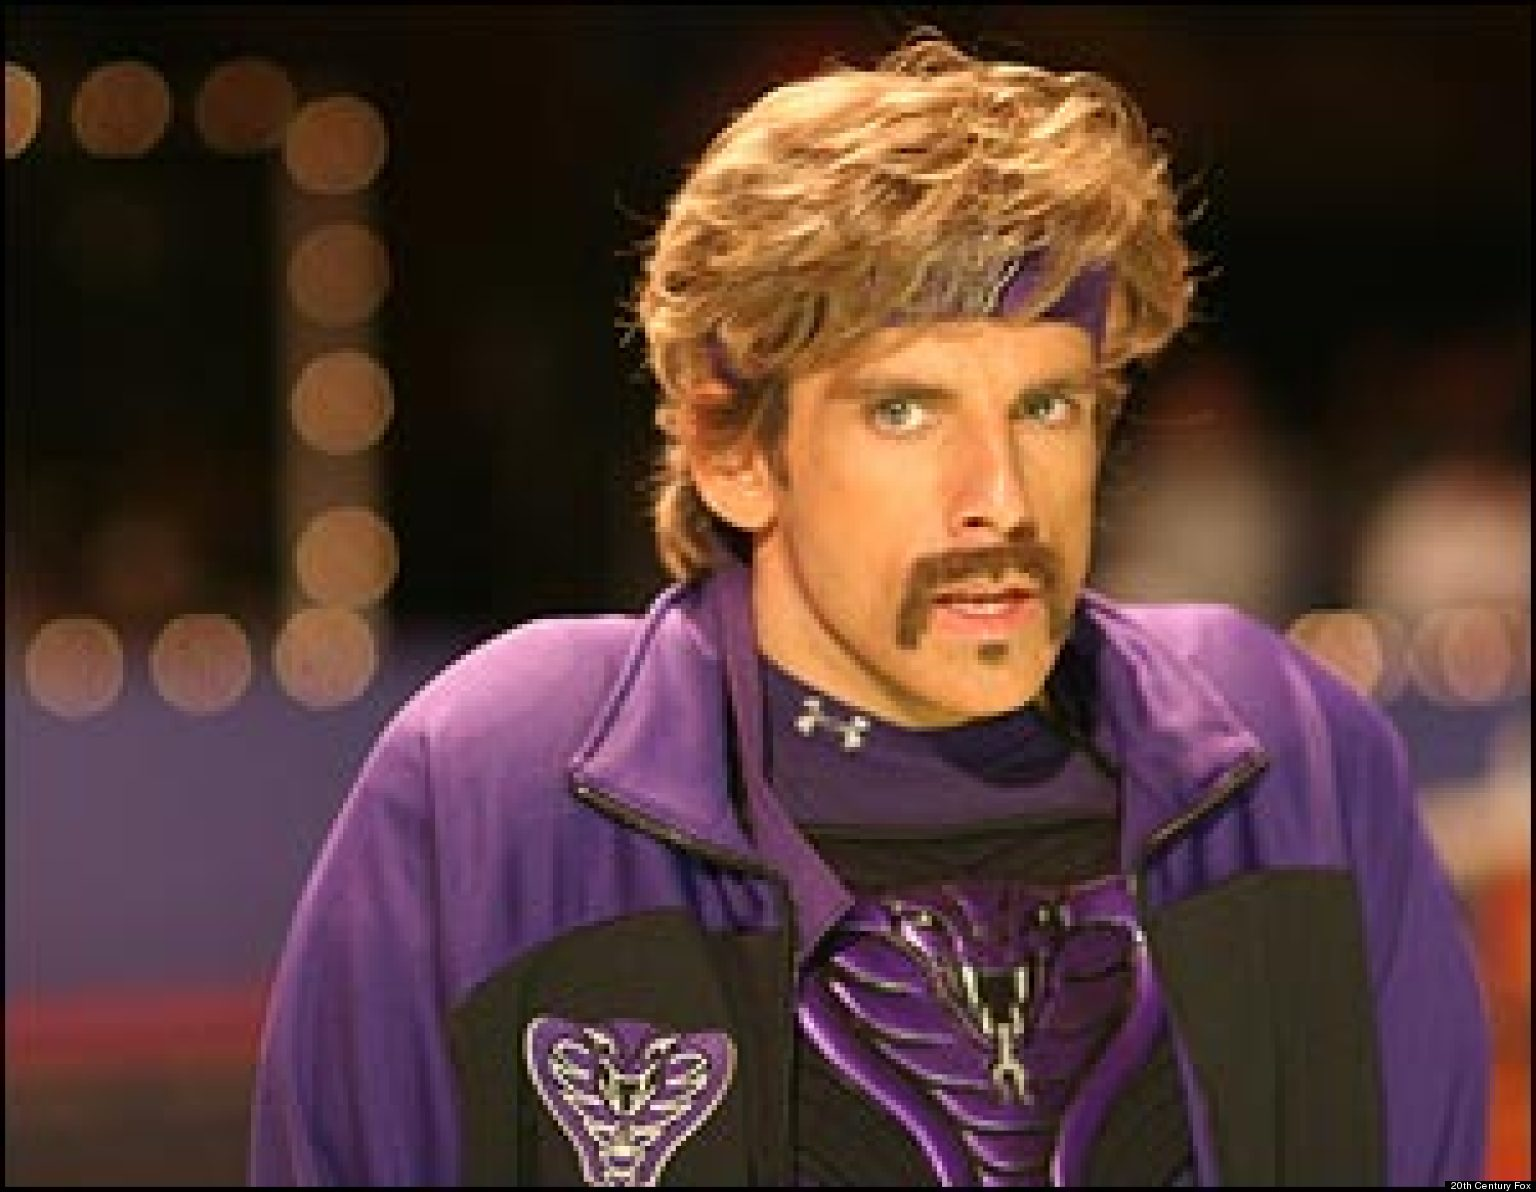 'Dodgeball' Sequel Confirmed: Ben Stiller And Vince Vaughn Bouncing Back Onto Screens